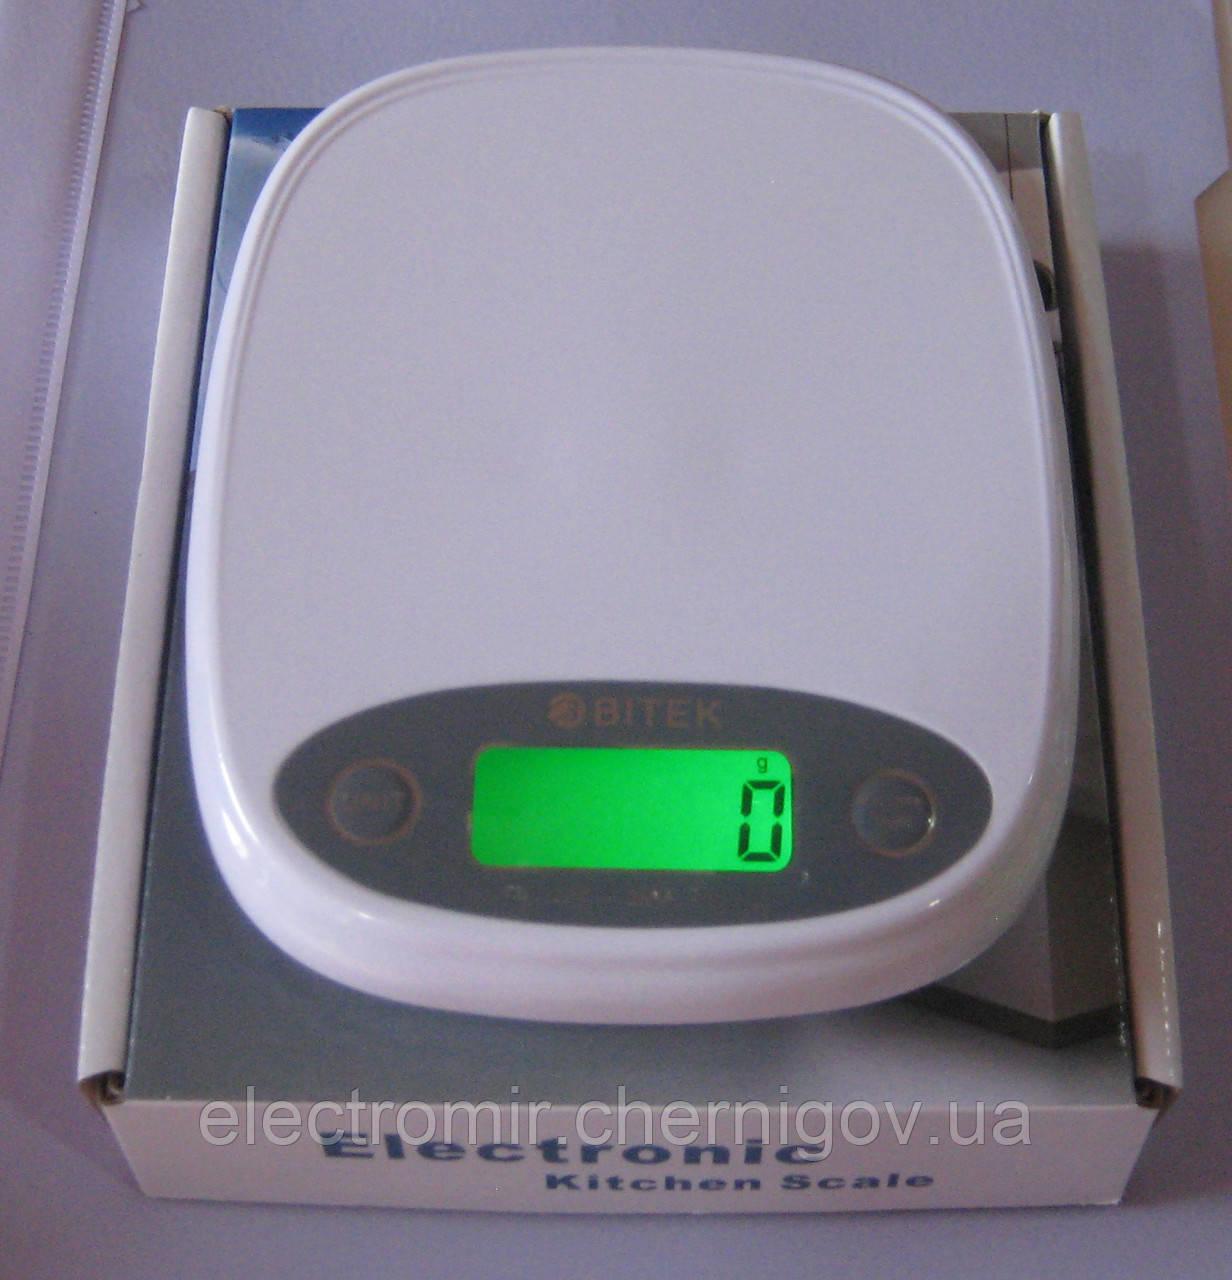 Весы кухонные Elektronic YZ-4182 (до 5 кг)